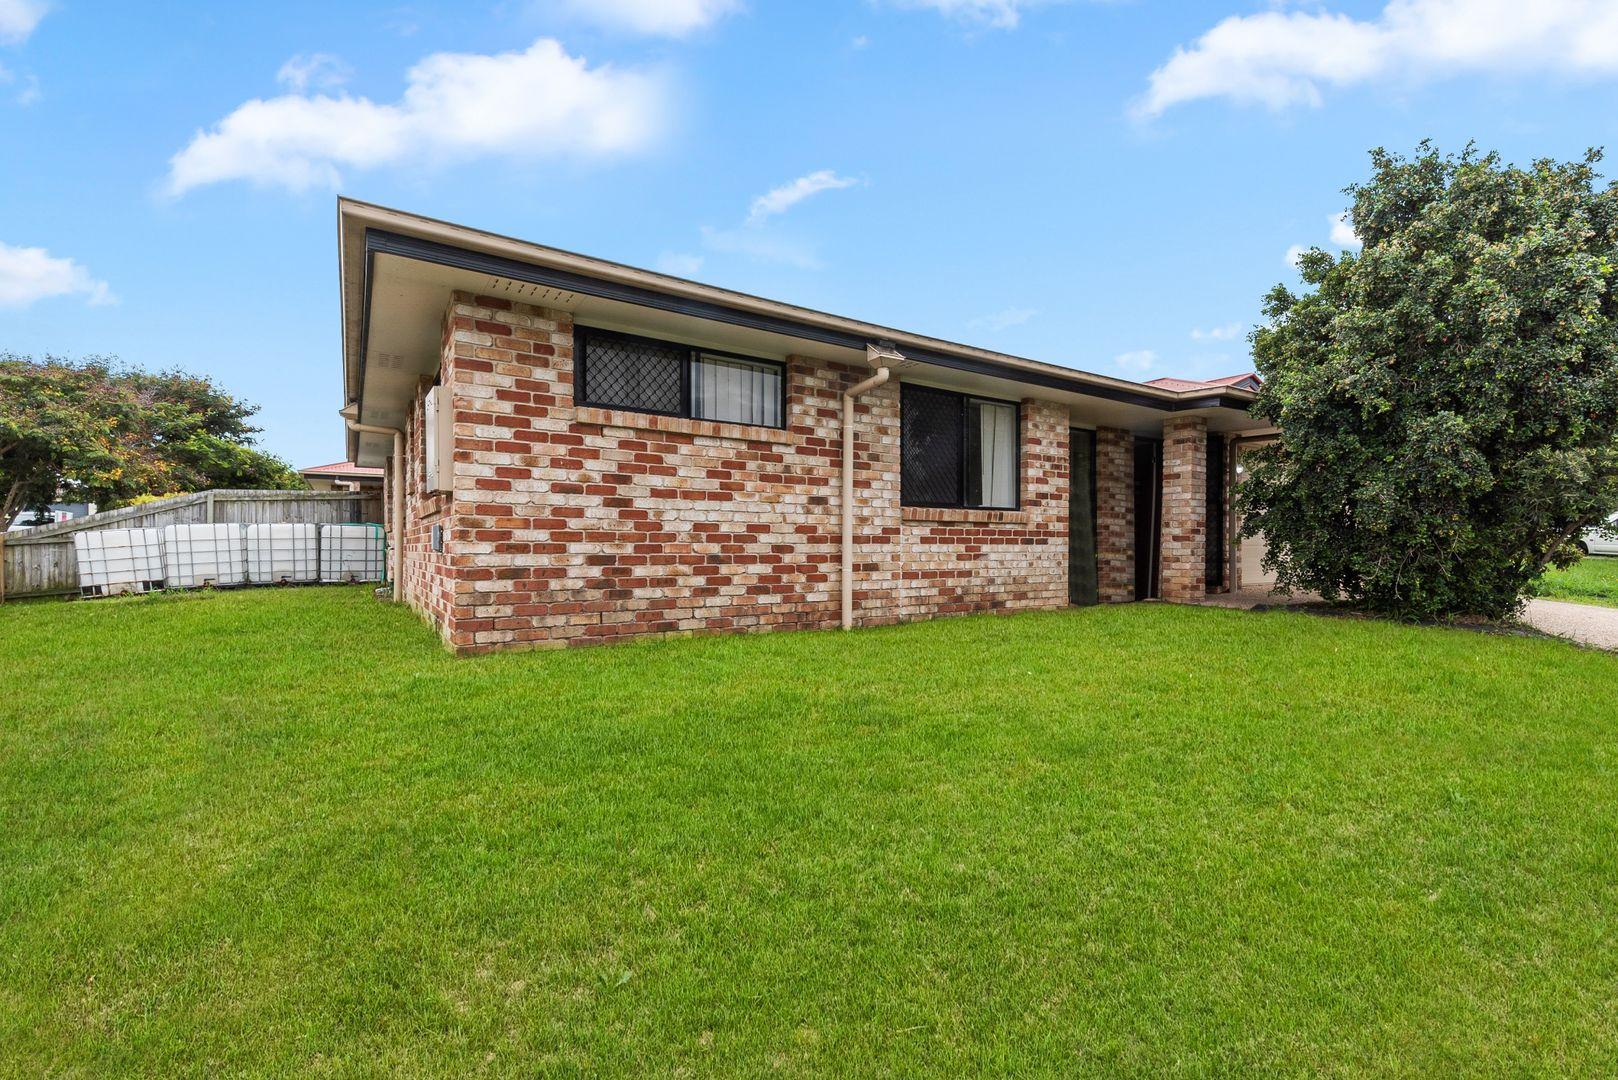 1b/16 Leichhardt Avenue, Rothwell QLD 4022, Image 1